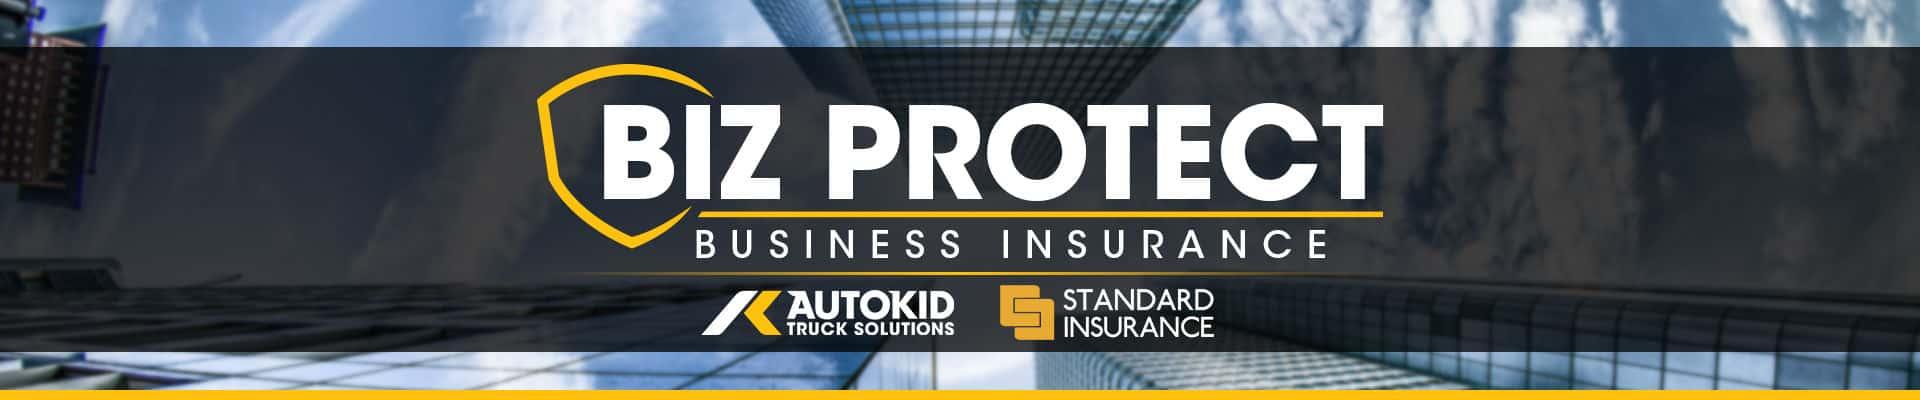 Autokid Standard Insurance Biz Protect Banner